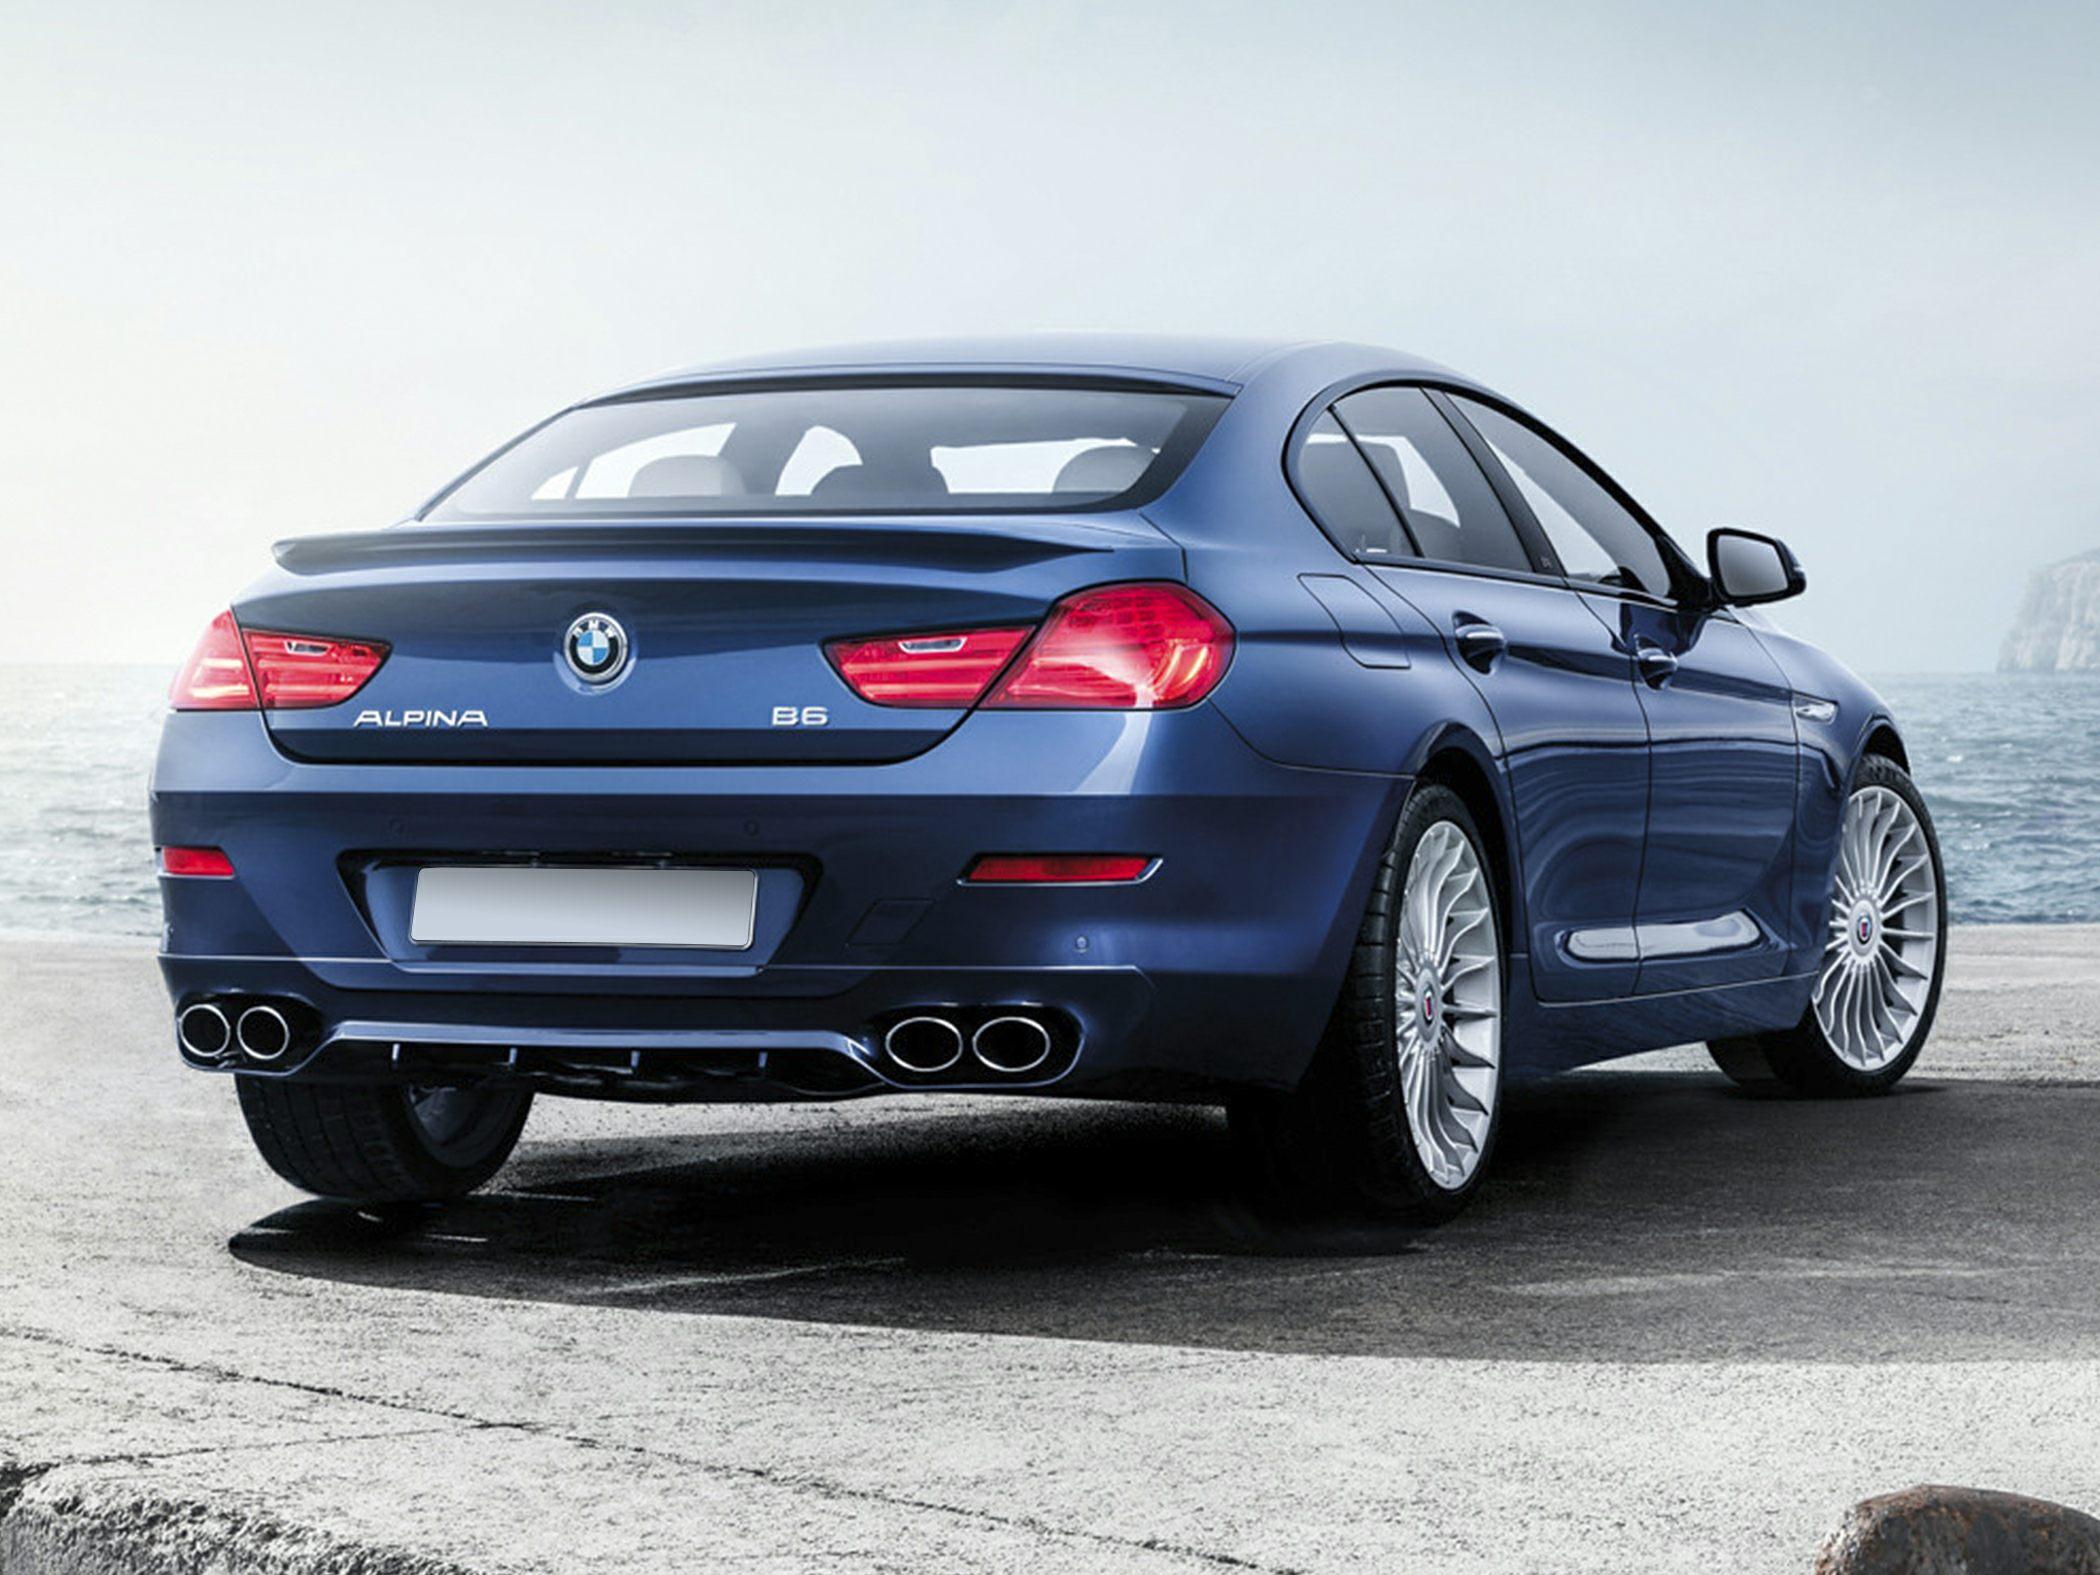 2018 BMW ALPINA B6 Gran Coupe Reviews, Specs and Prices | Cars.com